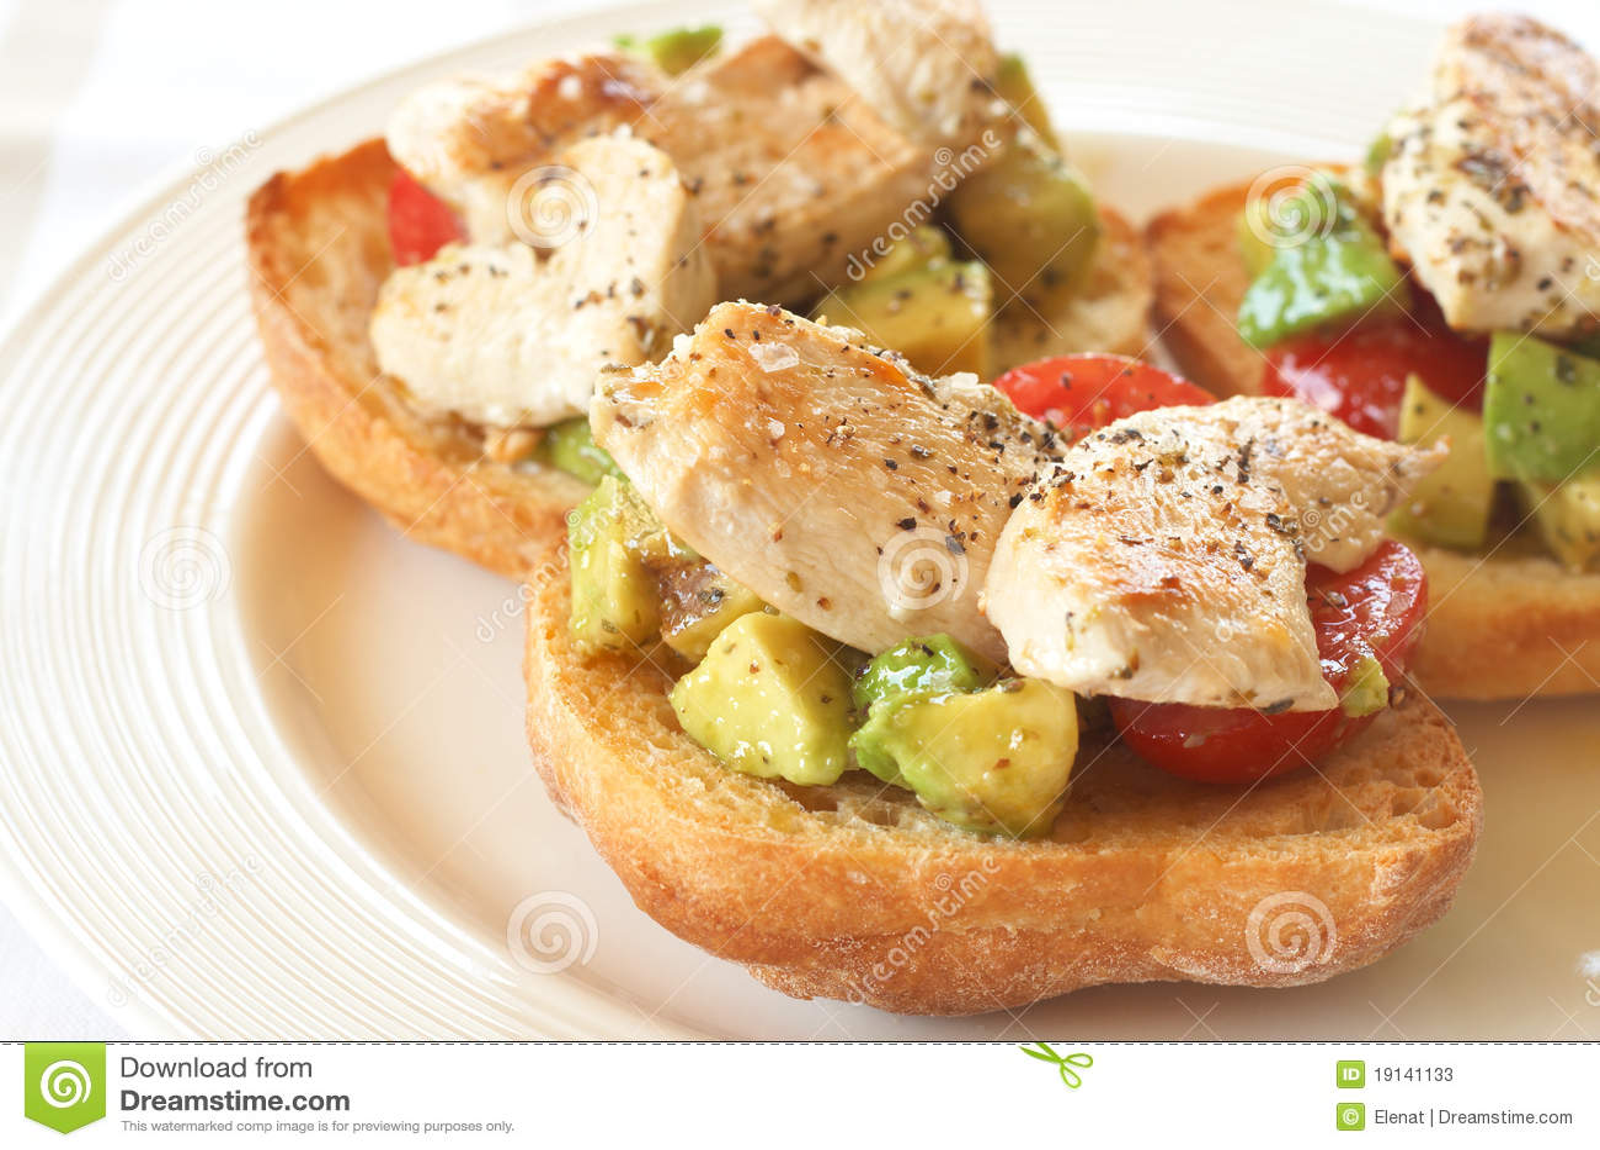 Tasty avocado, tomato and chicken bruschetta